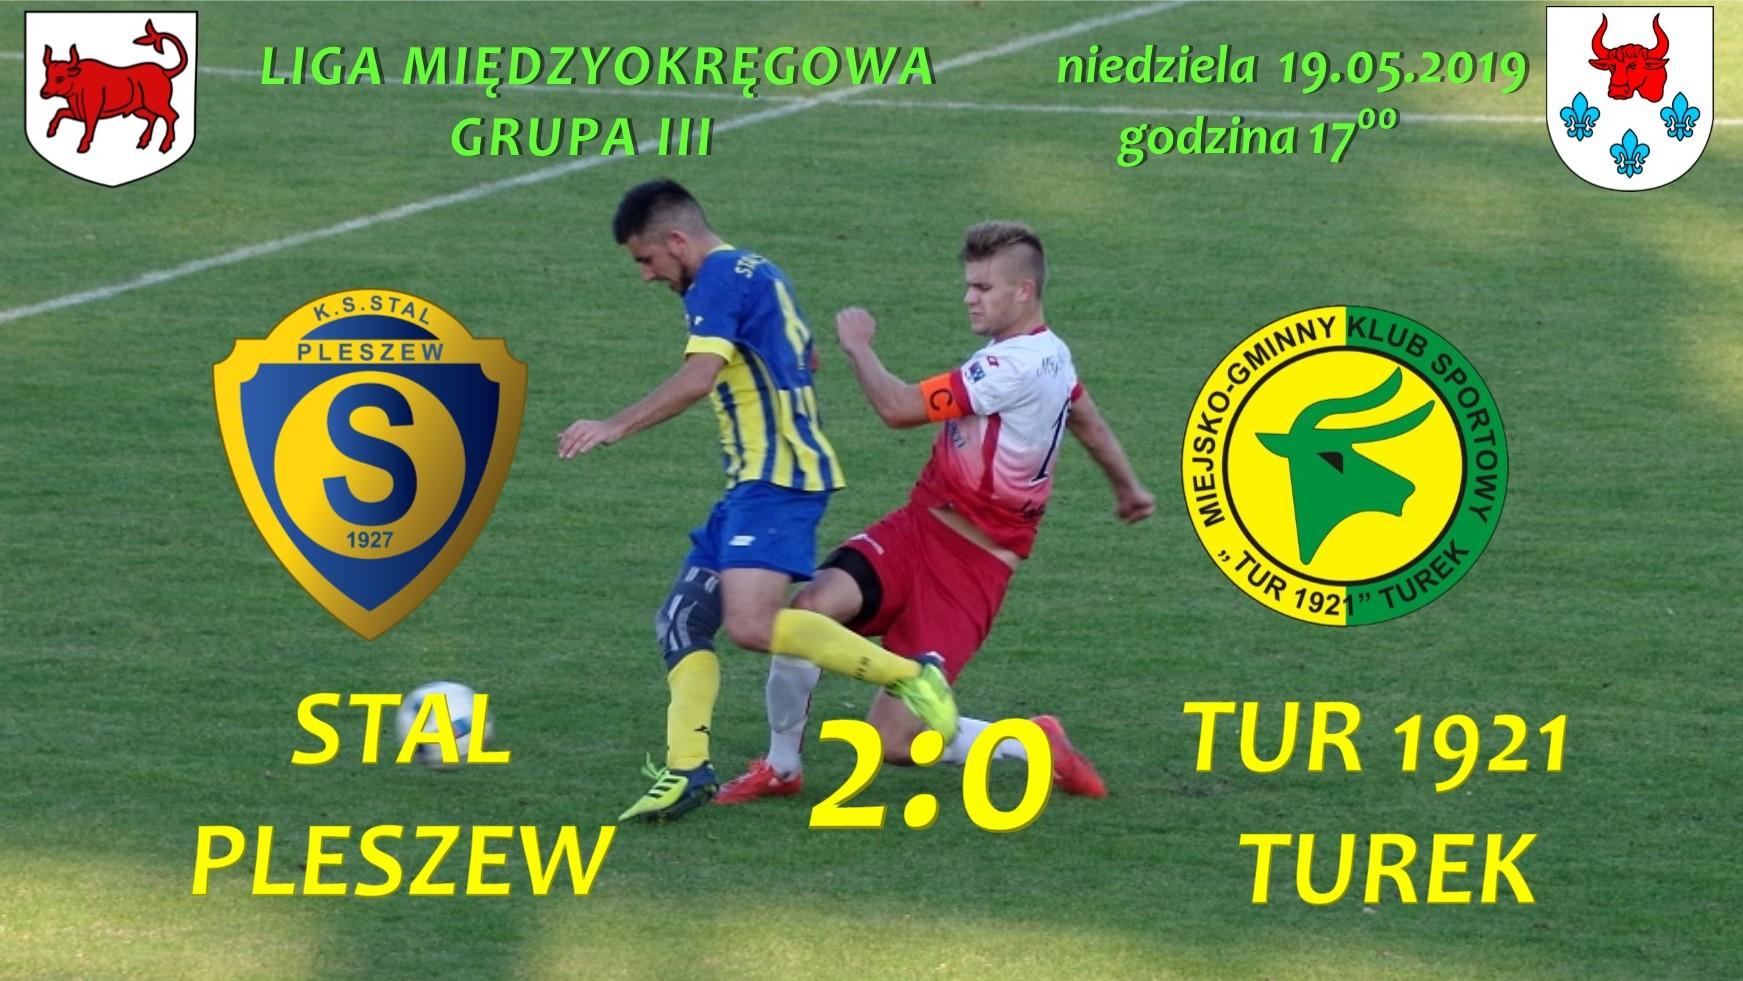 Stal Pleszew- Tur 1921 Turek 2:0, senior